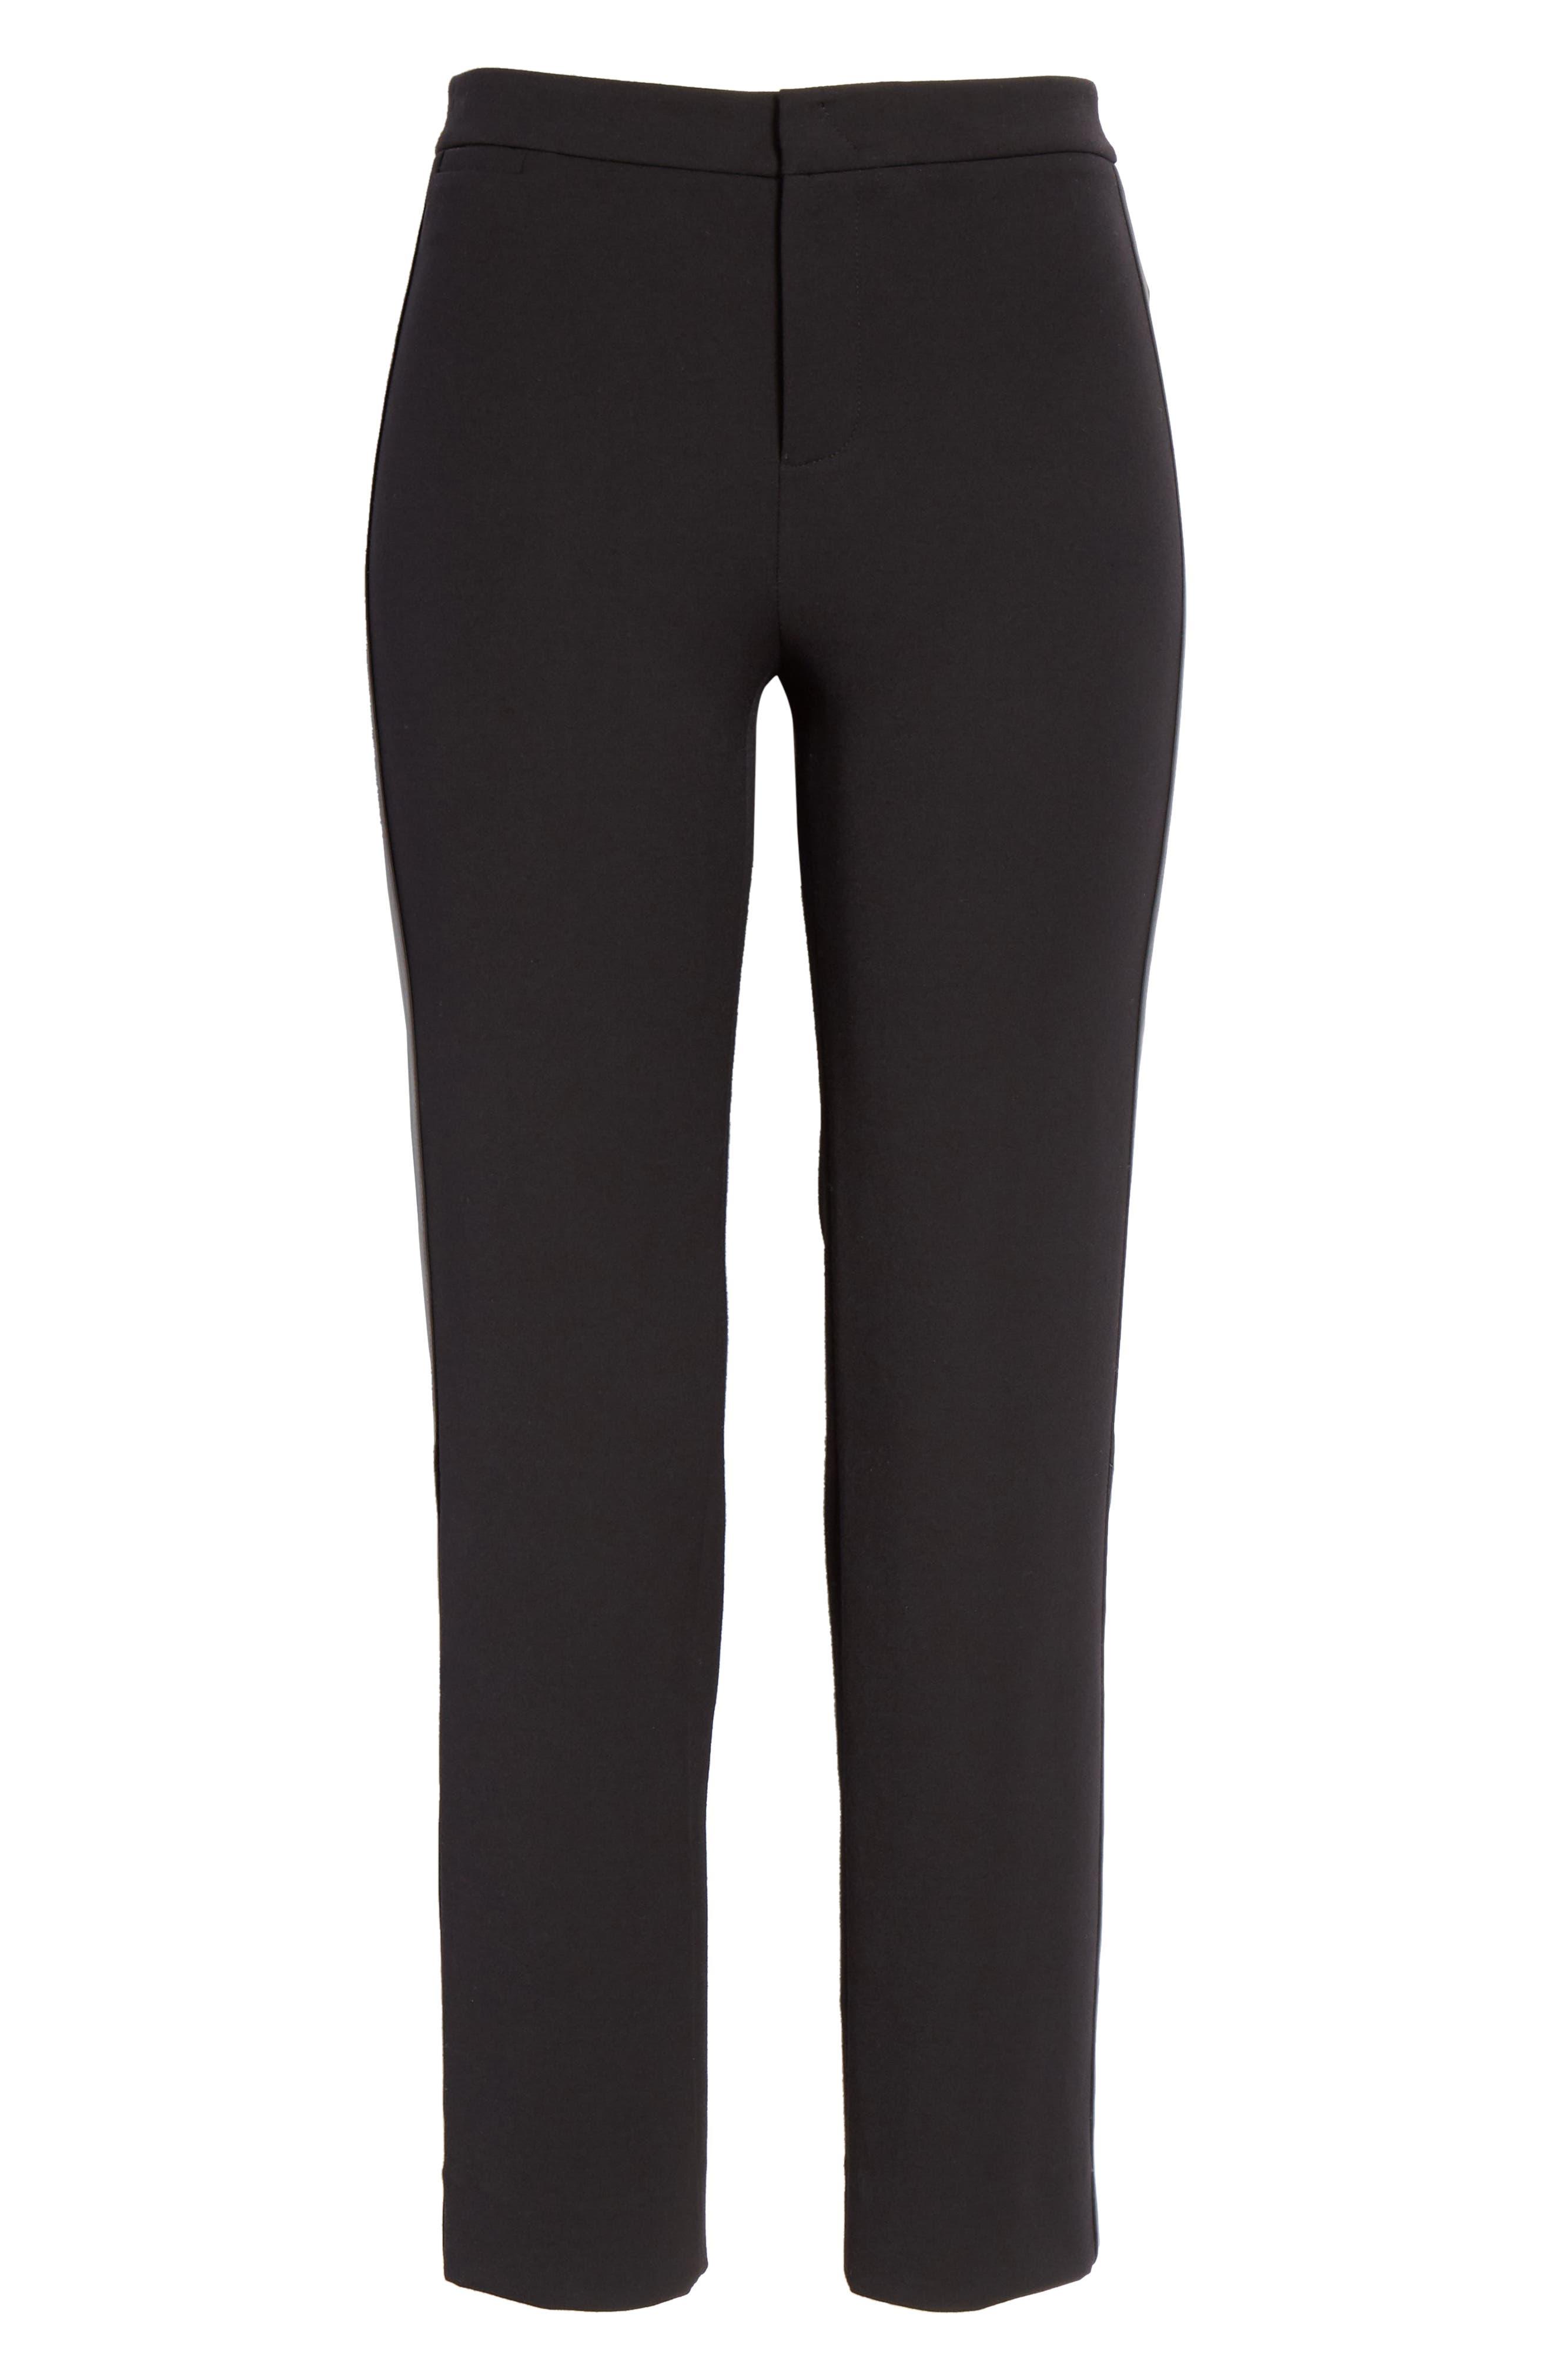 VINCE, Faux Leather Side Stripe Trousers, Alternate thumbnail 6, color, BLACK